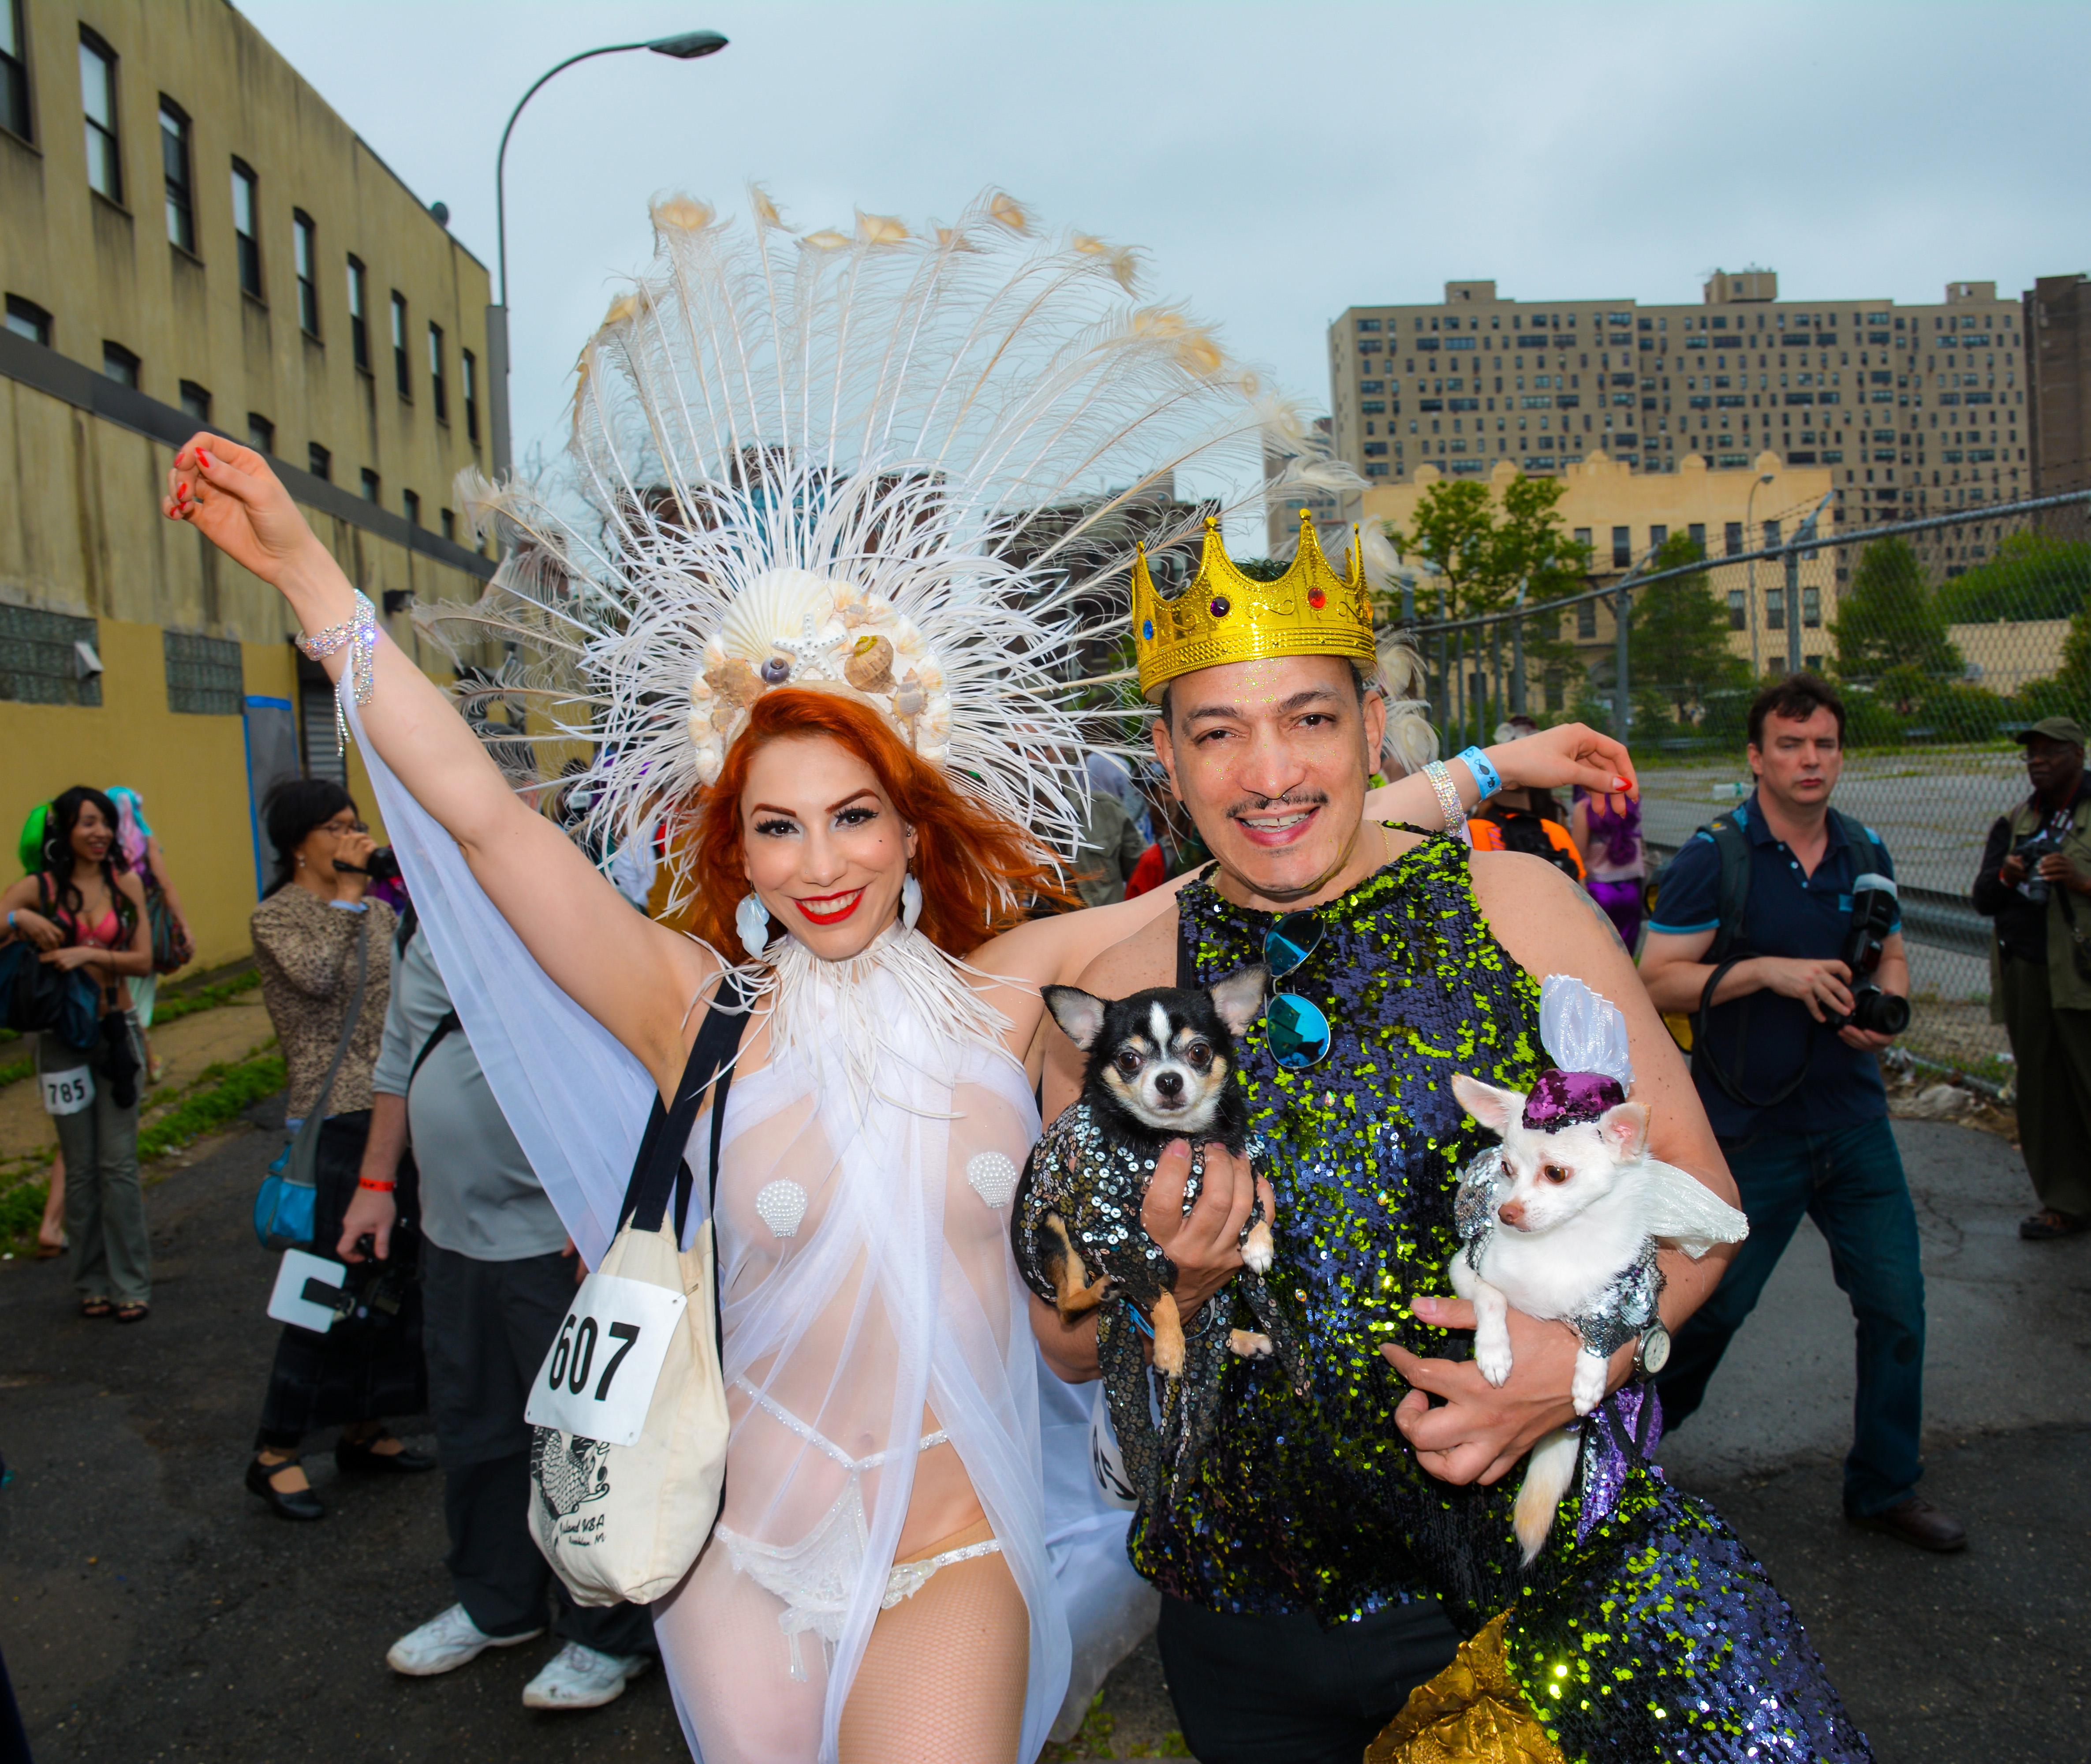 Anthony Rubio and Chihuahuas at the 2015 Coney Island Mermaid Parade